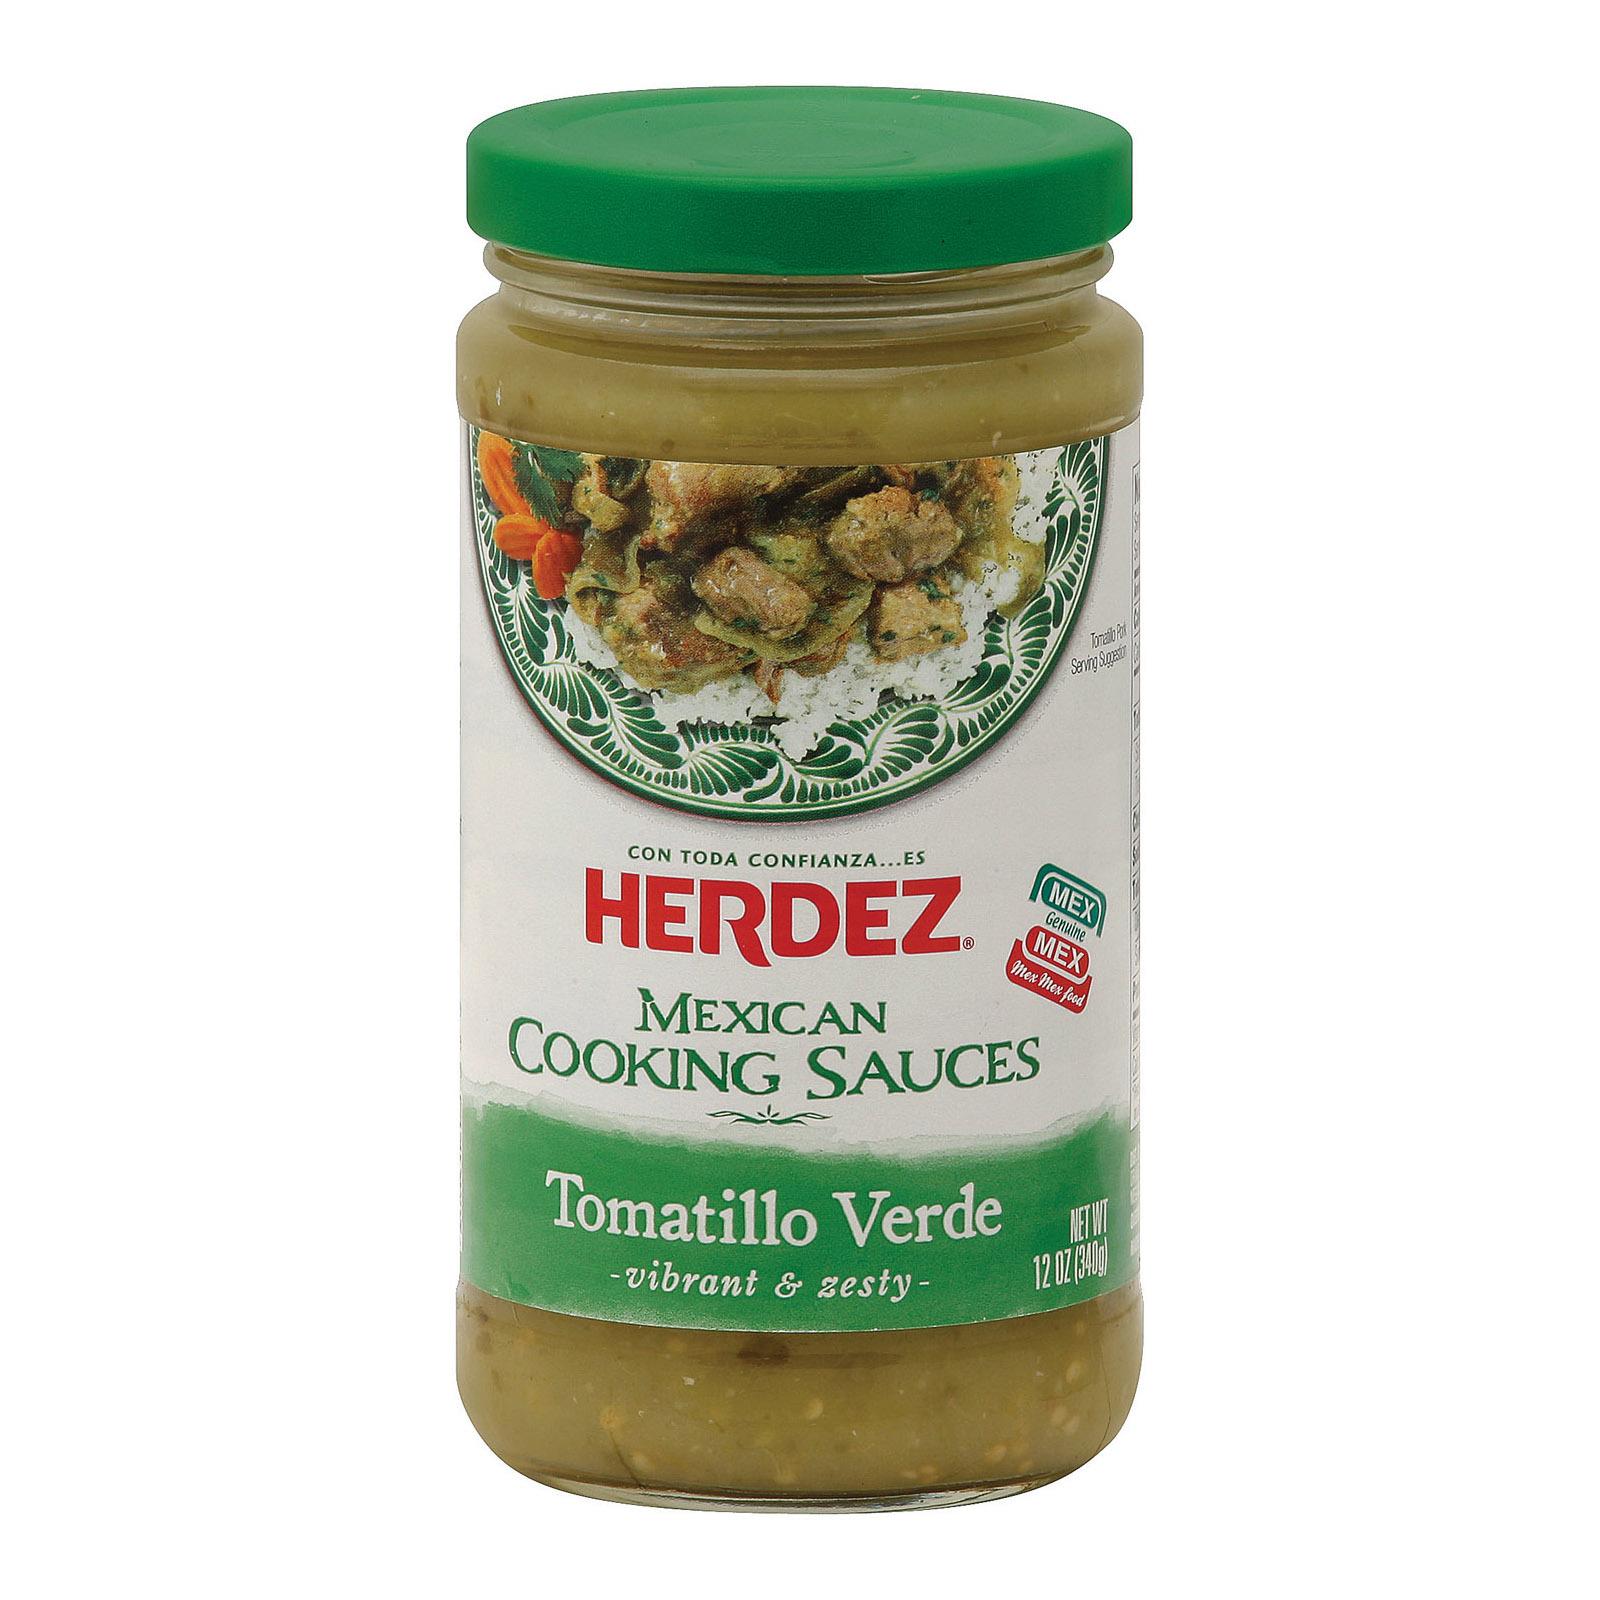 Herdez Cooking Sauce - Tomatillo Verde - Case of 6 - 12 oz.